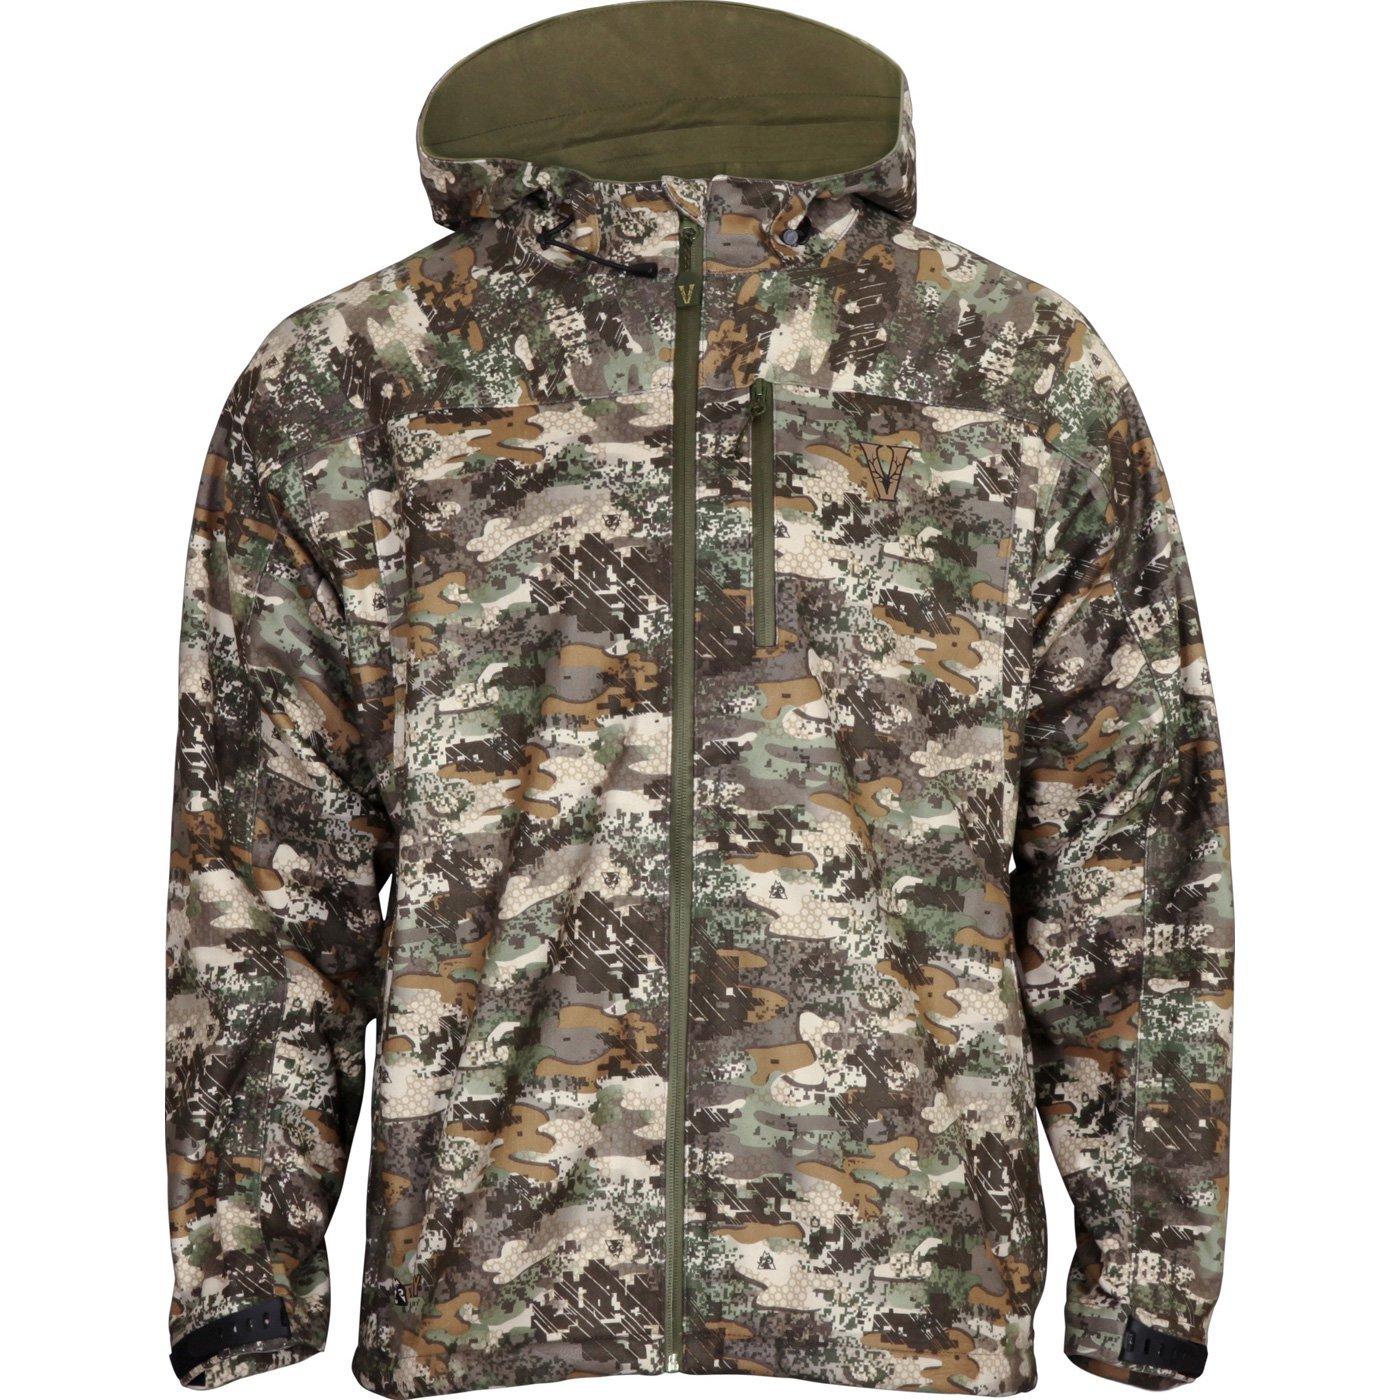 Rocky Men's Venator Waterproof 220G Insulated Jacket, Camouflage, Large